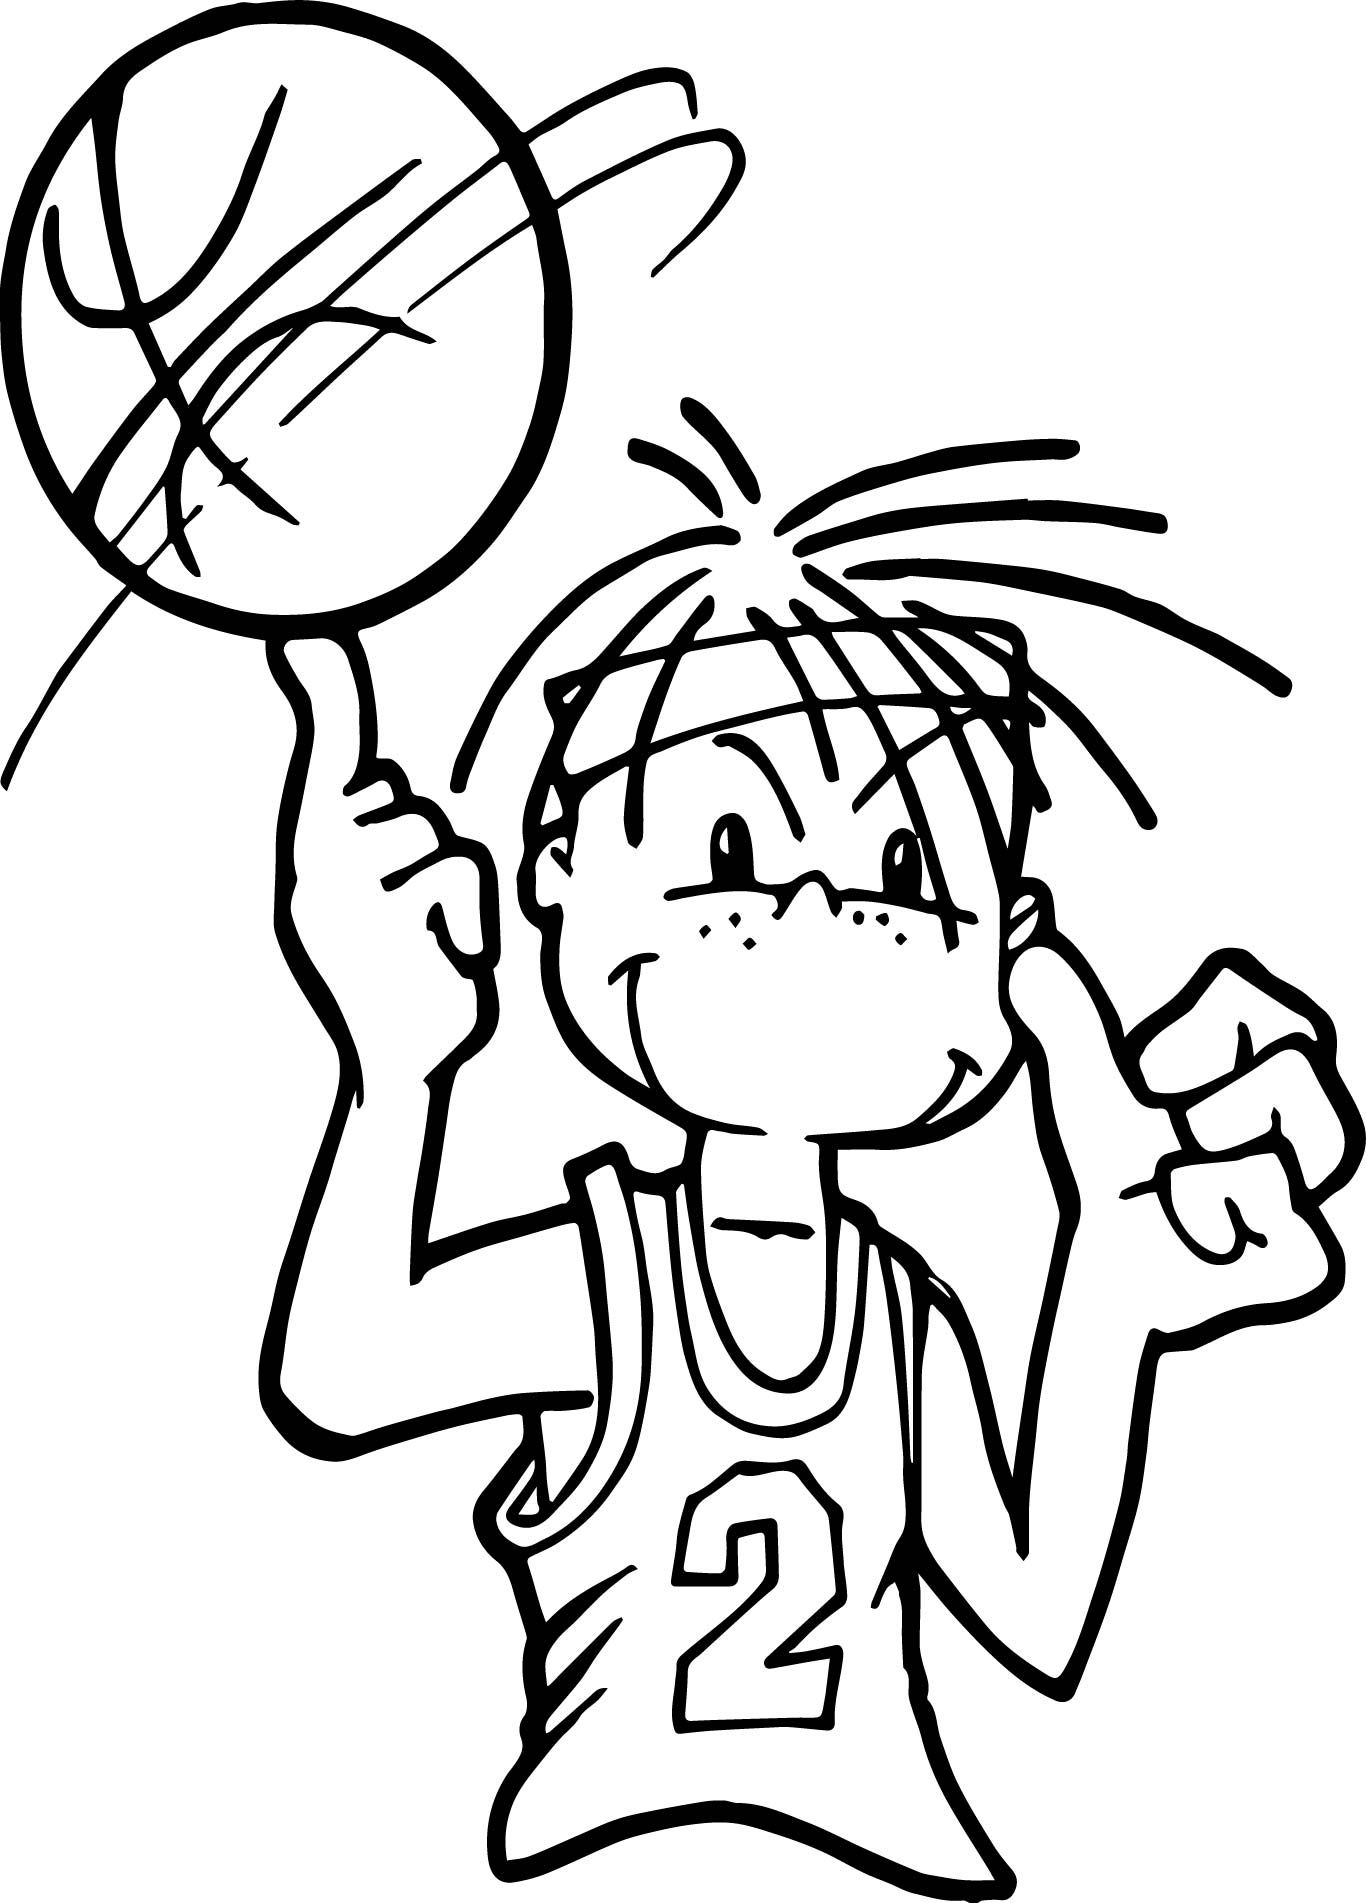 Awesome Boy Playing Basketball Coloring Page Em 2020 Desenhos